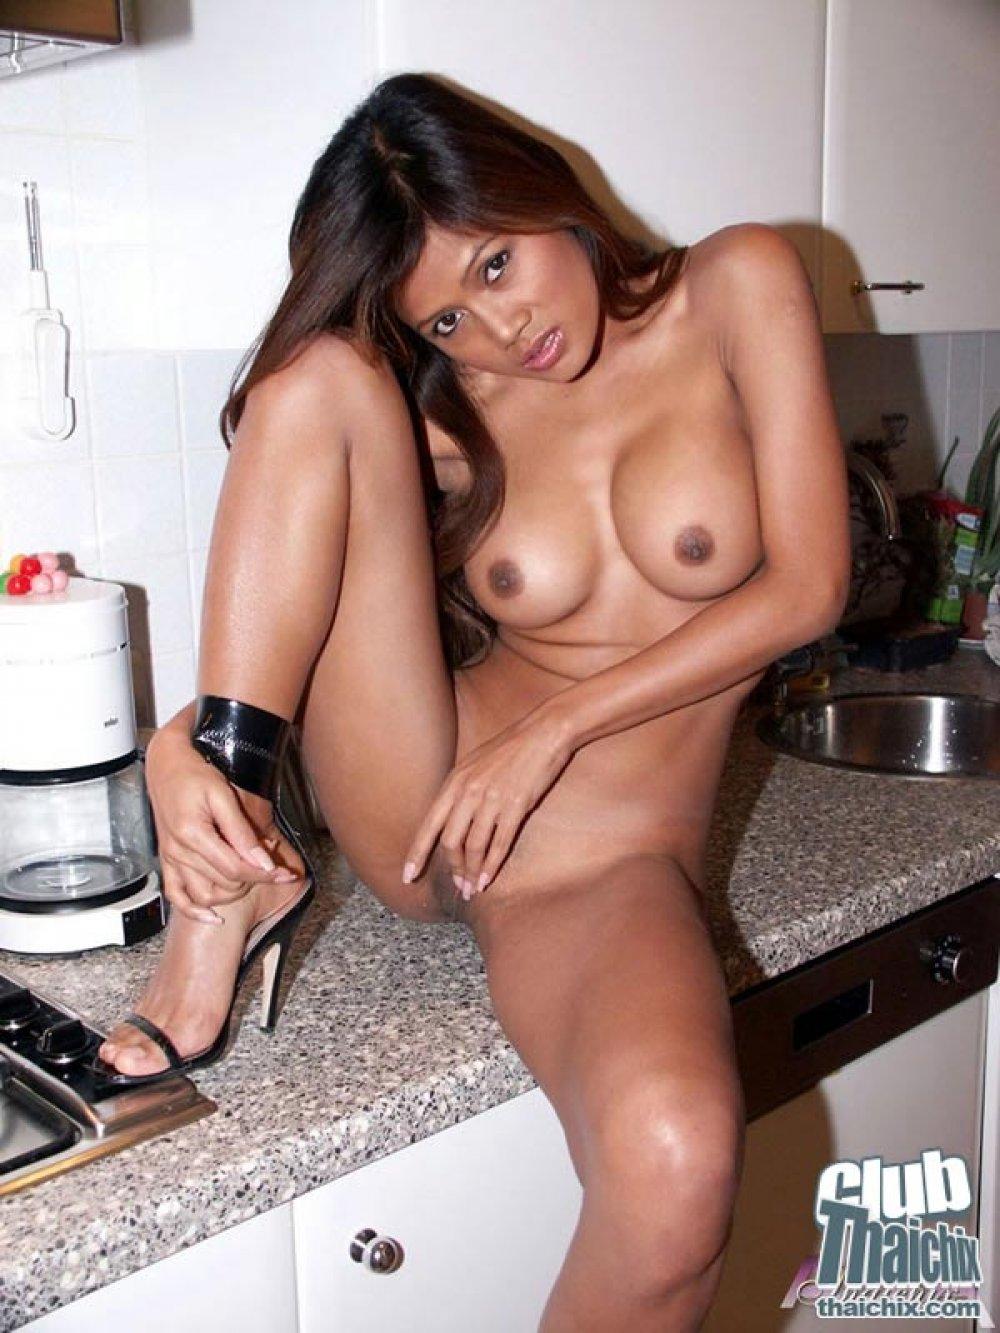 Pixie acia nude stripper pics sex scenes